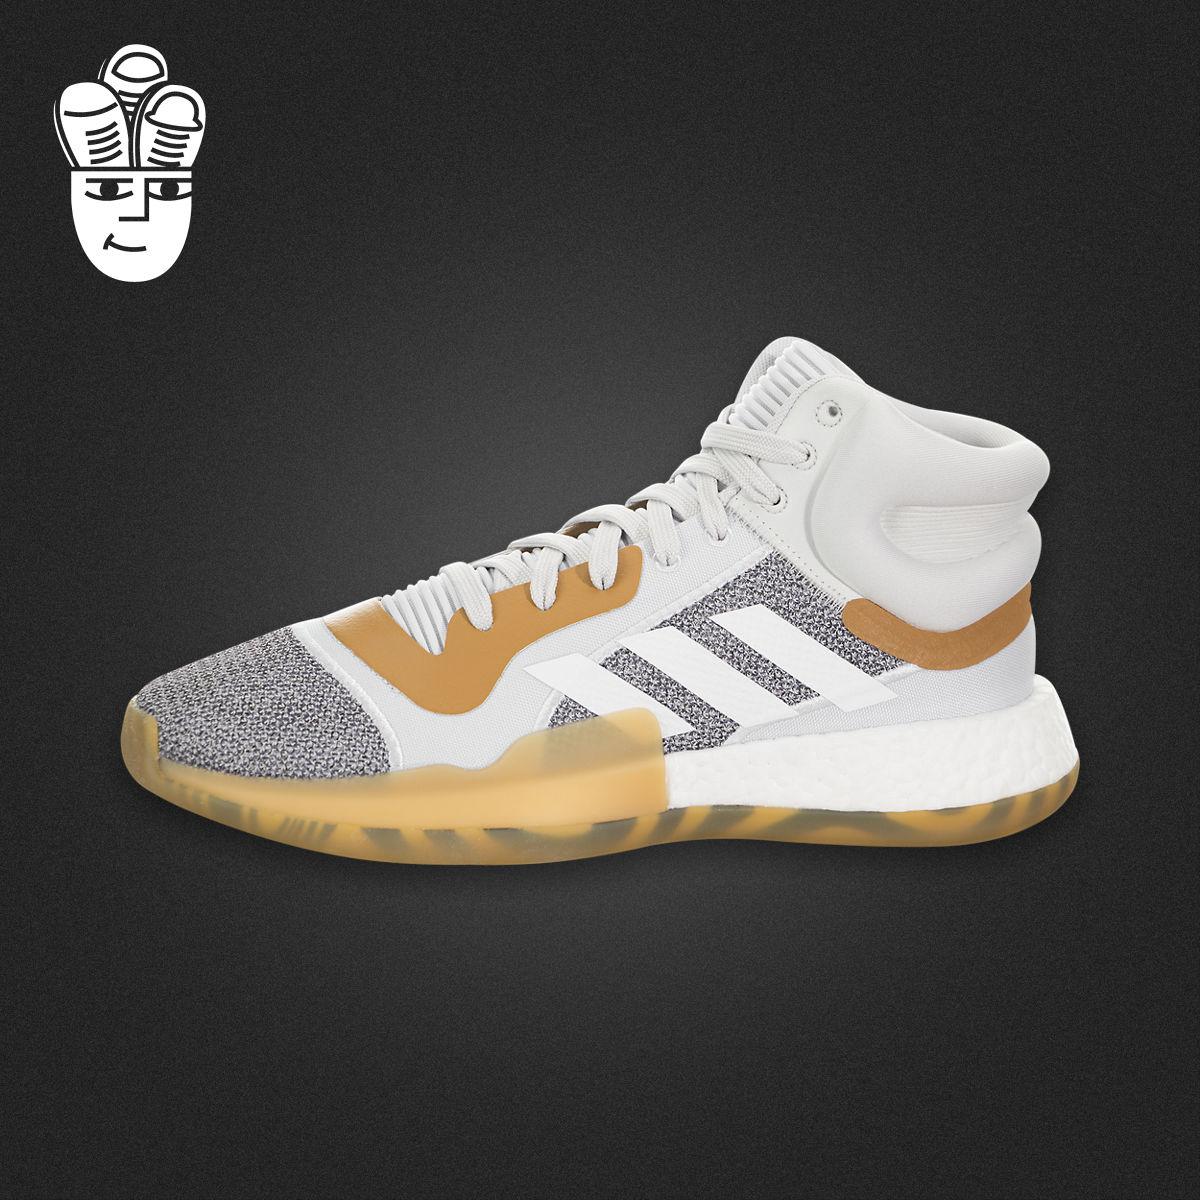 Adidas Marquee Boost阿迪达斯男鞋 全新高性能实战篮球鞋 g27737